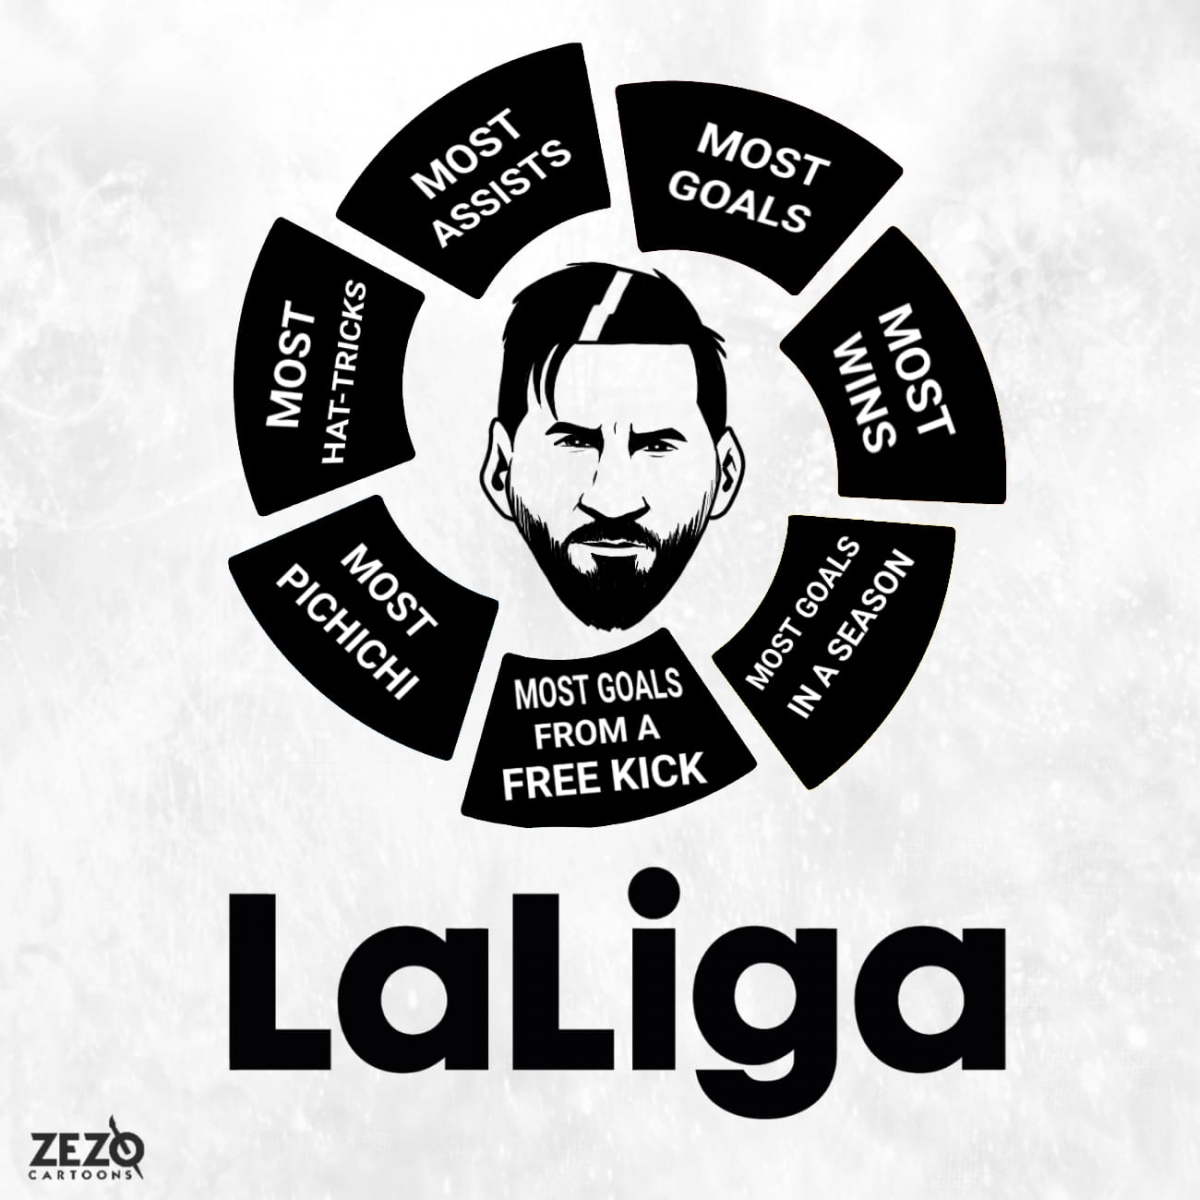 Lionel Messi - Kỷ lục gia của La Liga. (Ảnh: Footy Toonz)